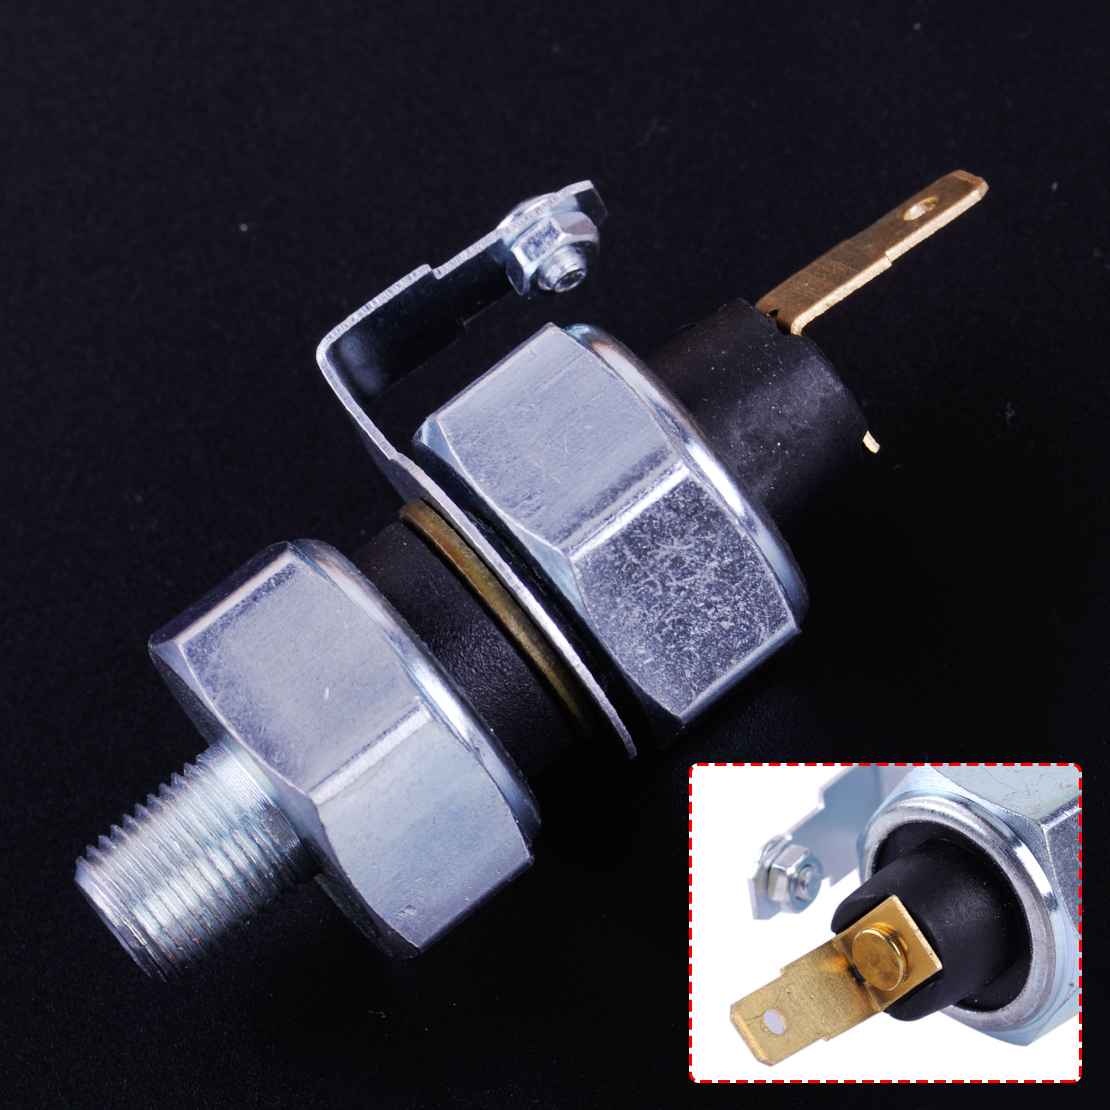 LETAOSK Oil Alarm Sensor Fit For Kipor Kama KM186F Diesel Generator Parts